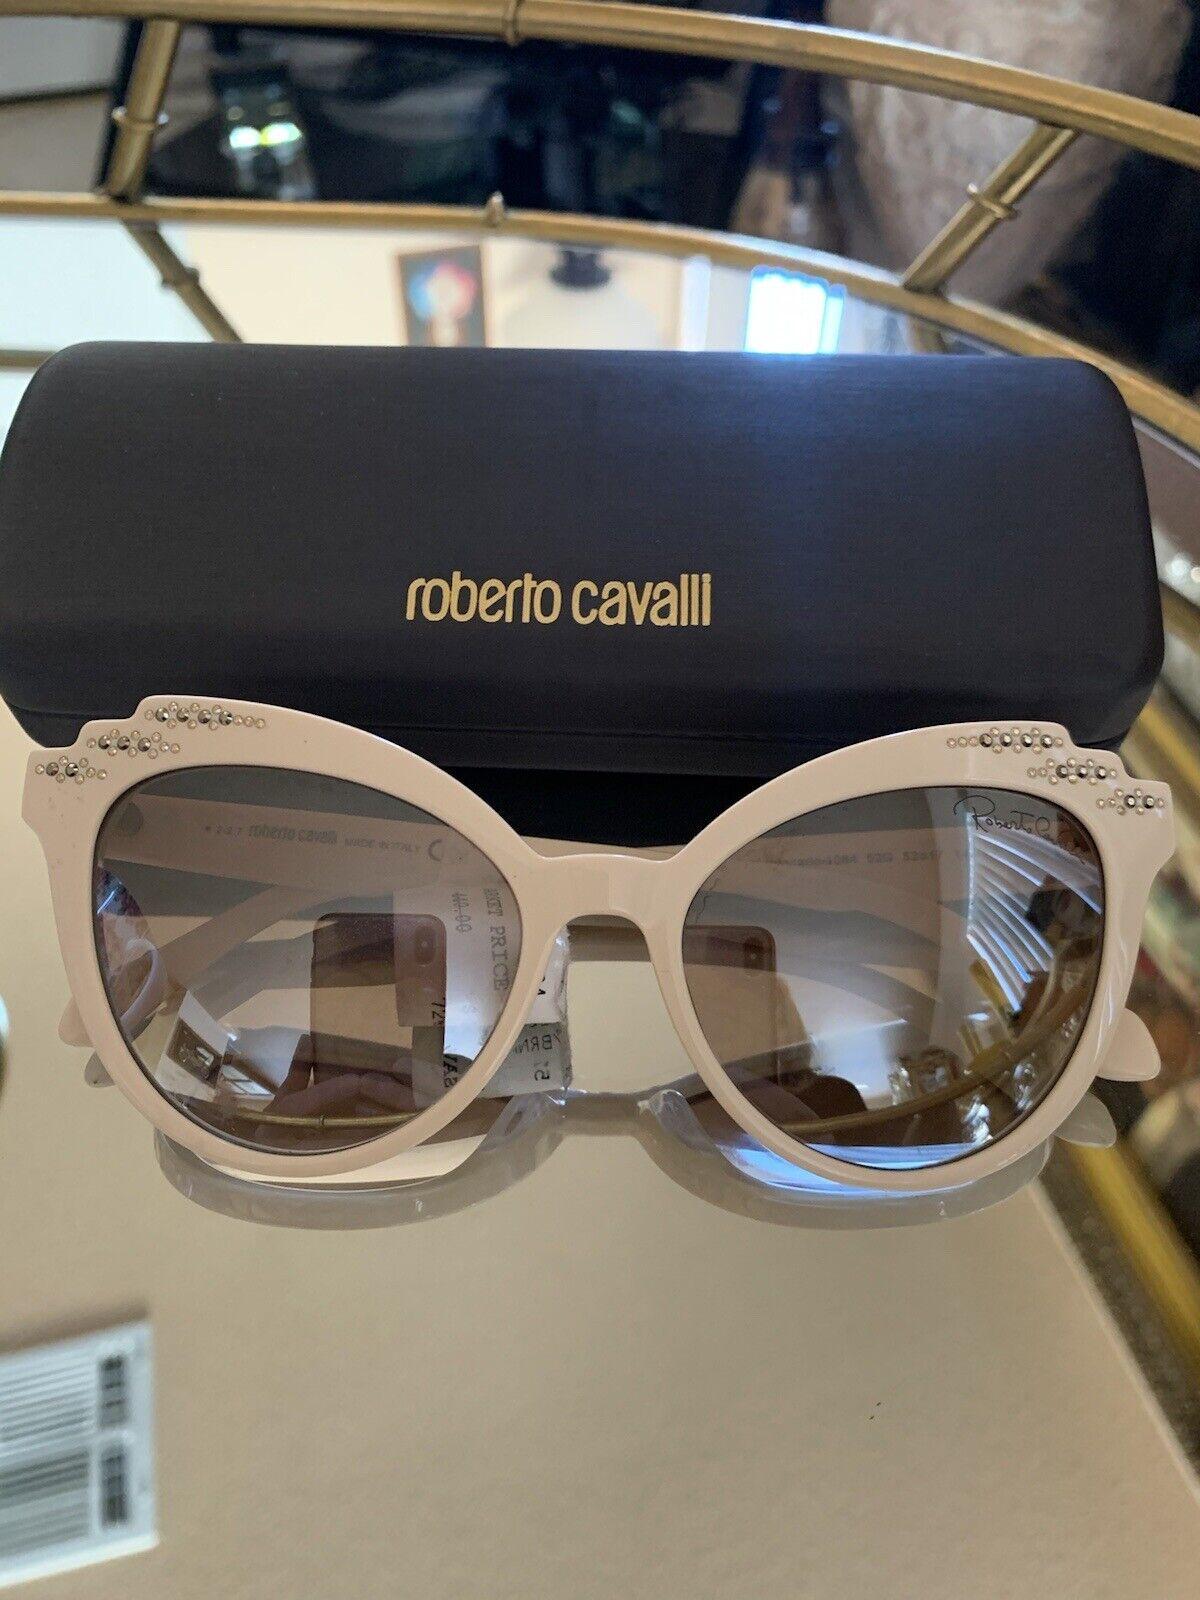 Authentic Roberto Cavalli Sunglasses Montecarlo New With Tags Retail